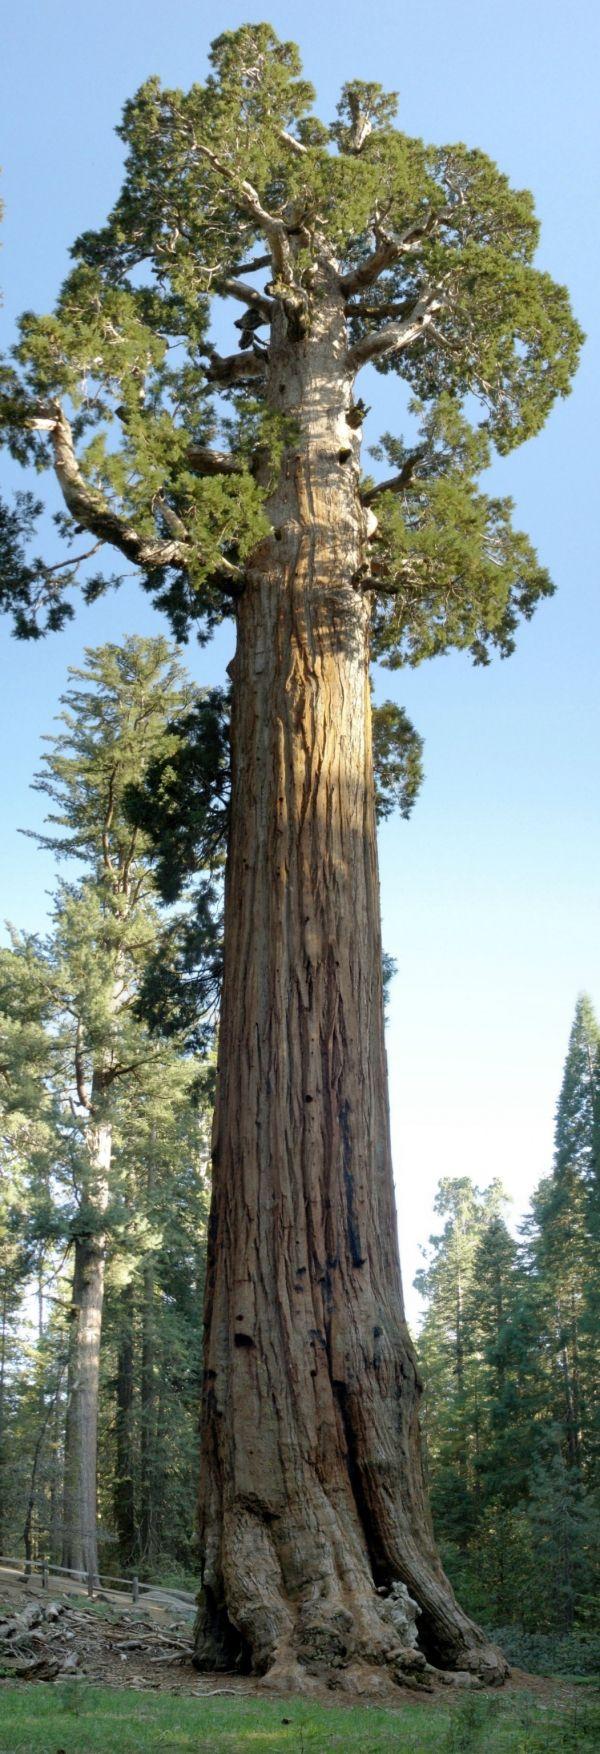 Secuoya gigante 'General Grant' en Grant's Grove, Kings Canyon National Park, Estados Unidos